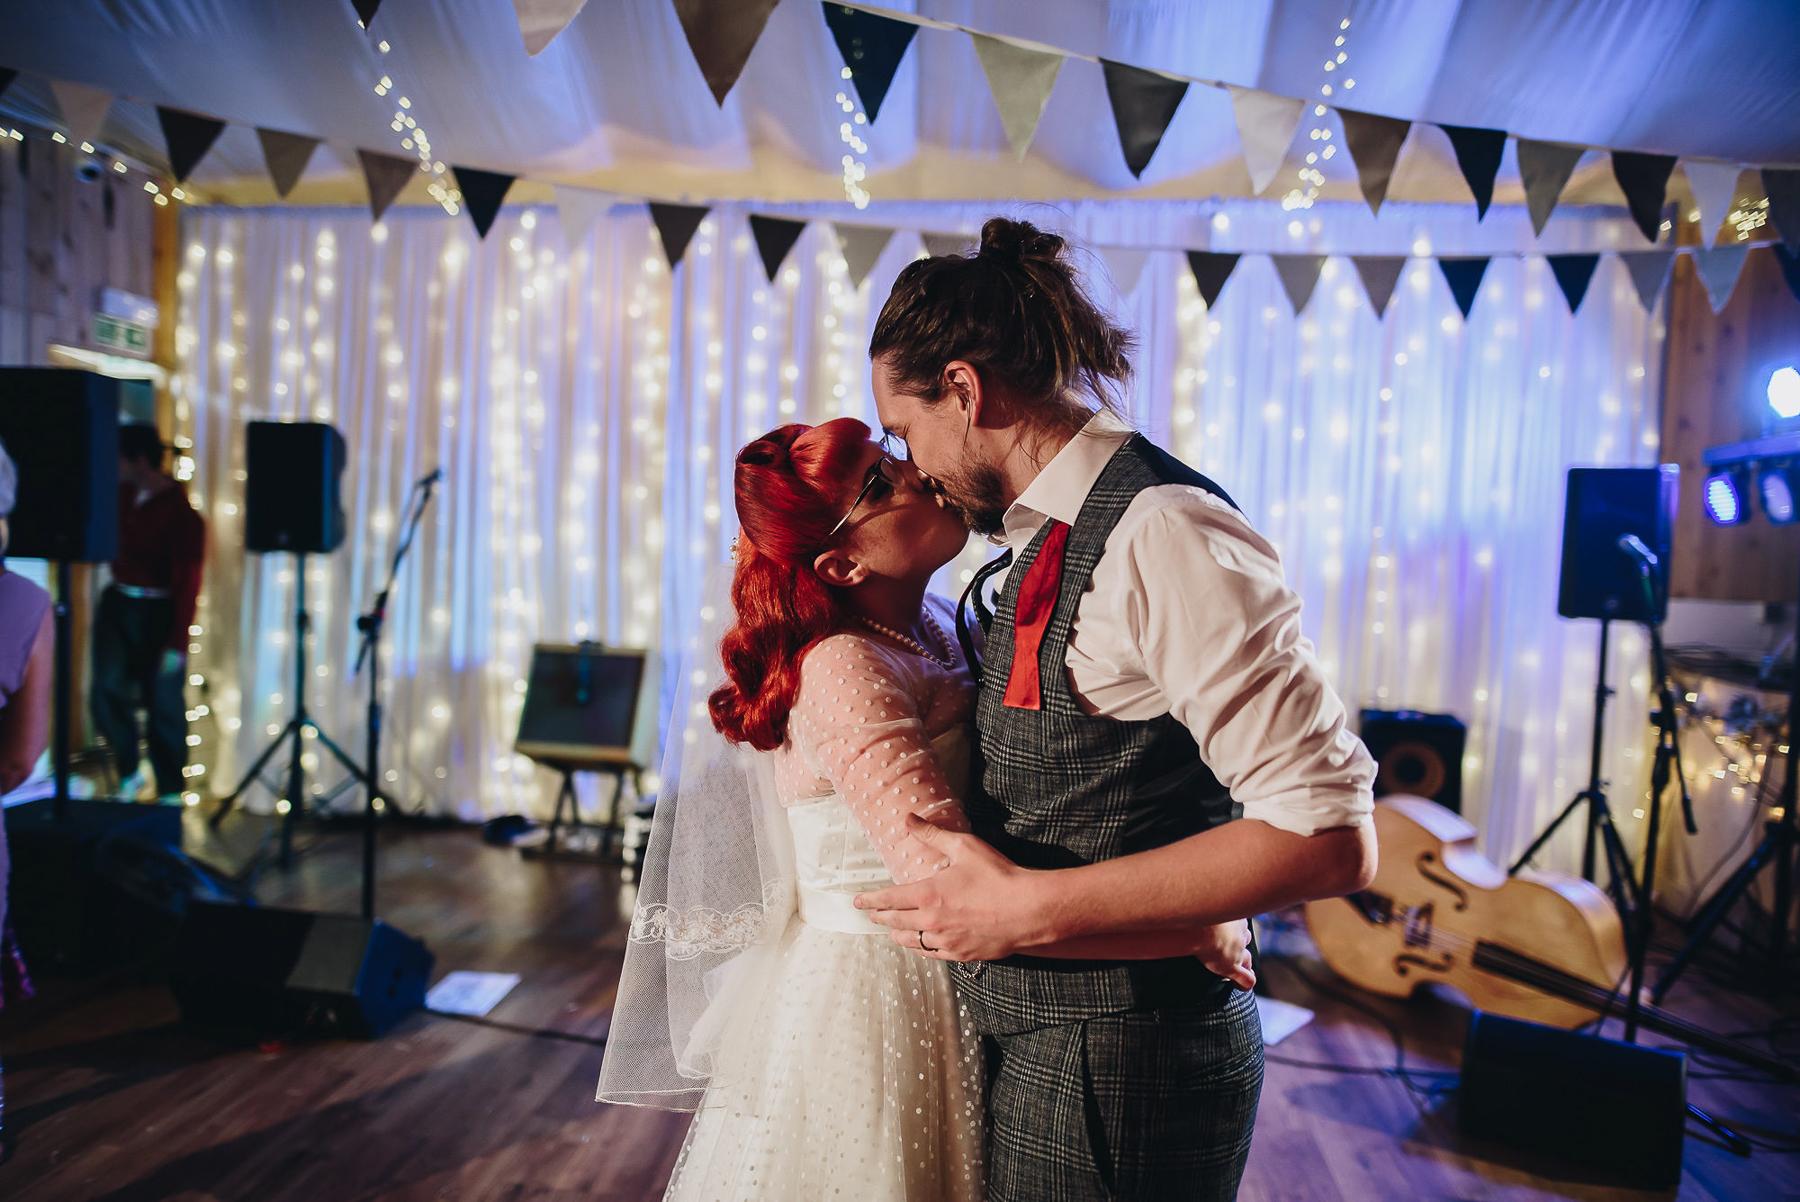 Wellbeing_Farm_Wedding_Photography_The_Pin-Up_Bride_Lara_Shaun-141.jpg